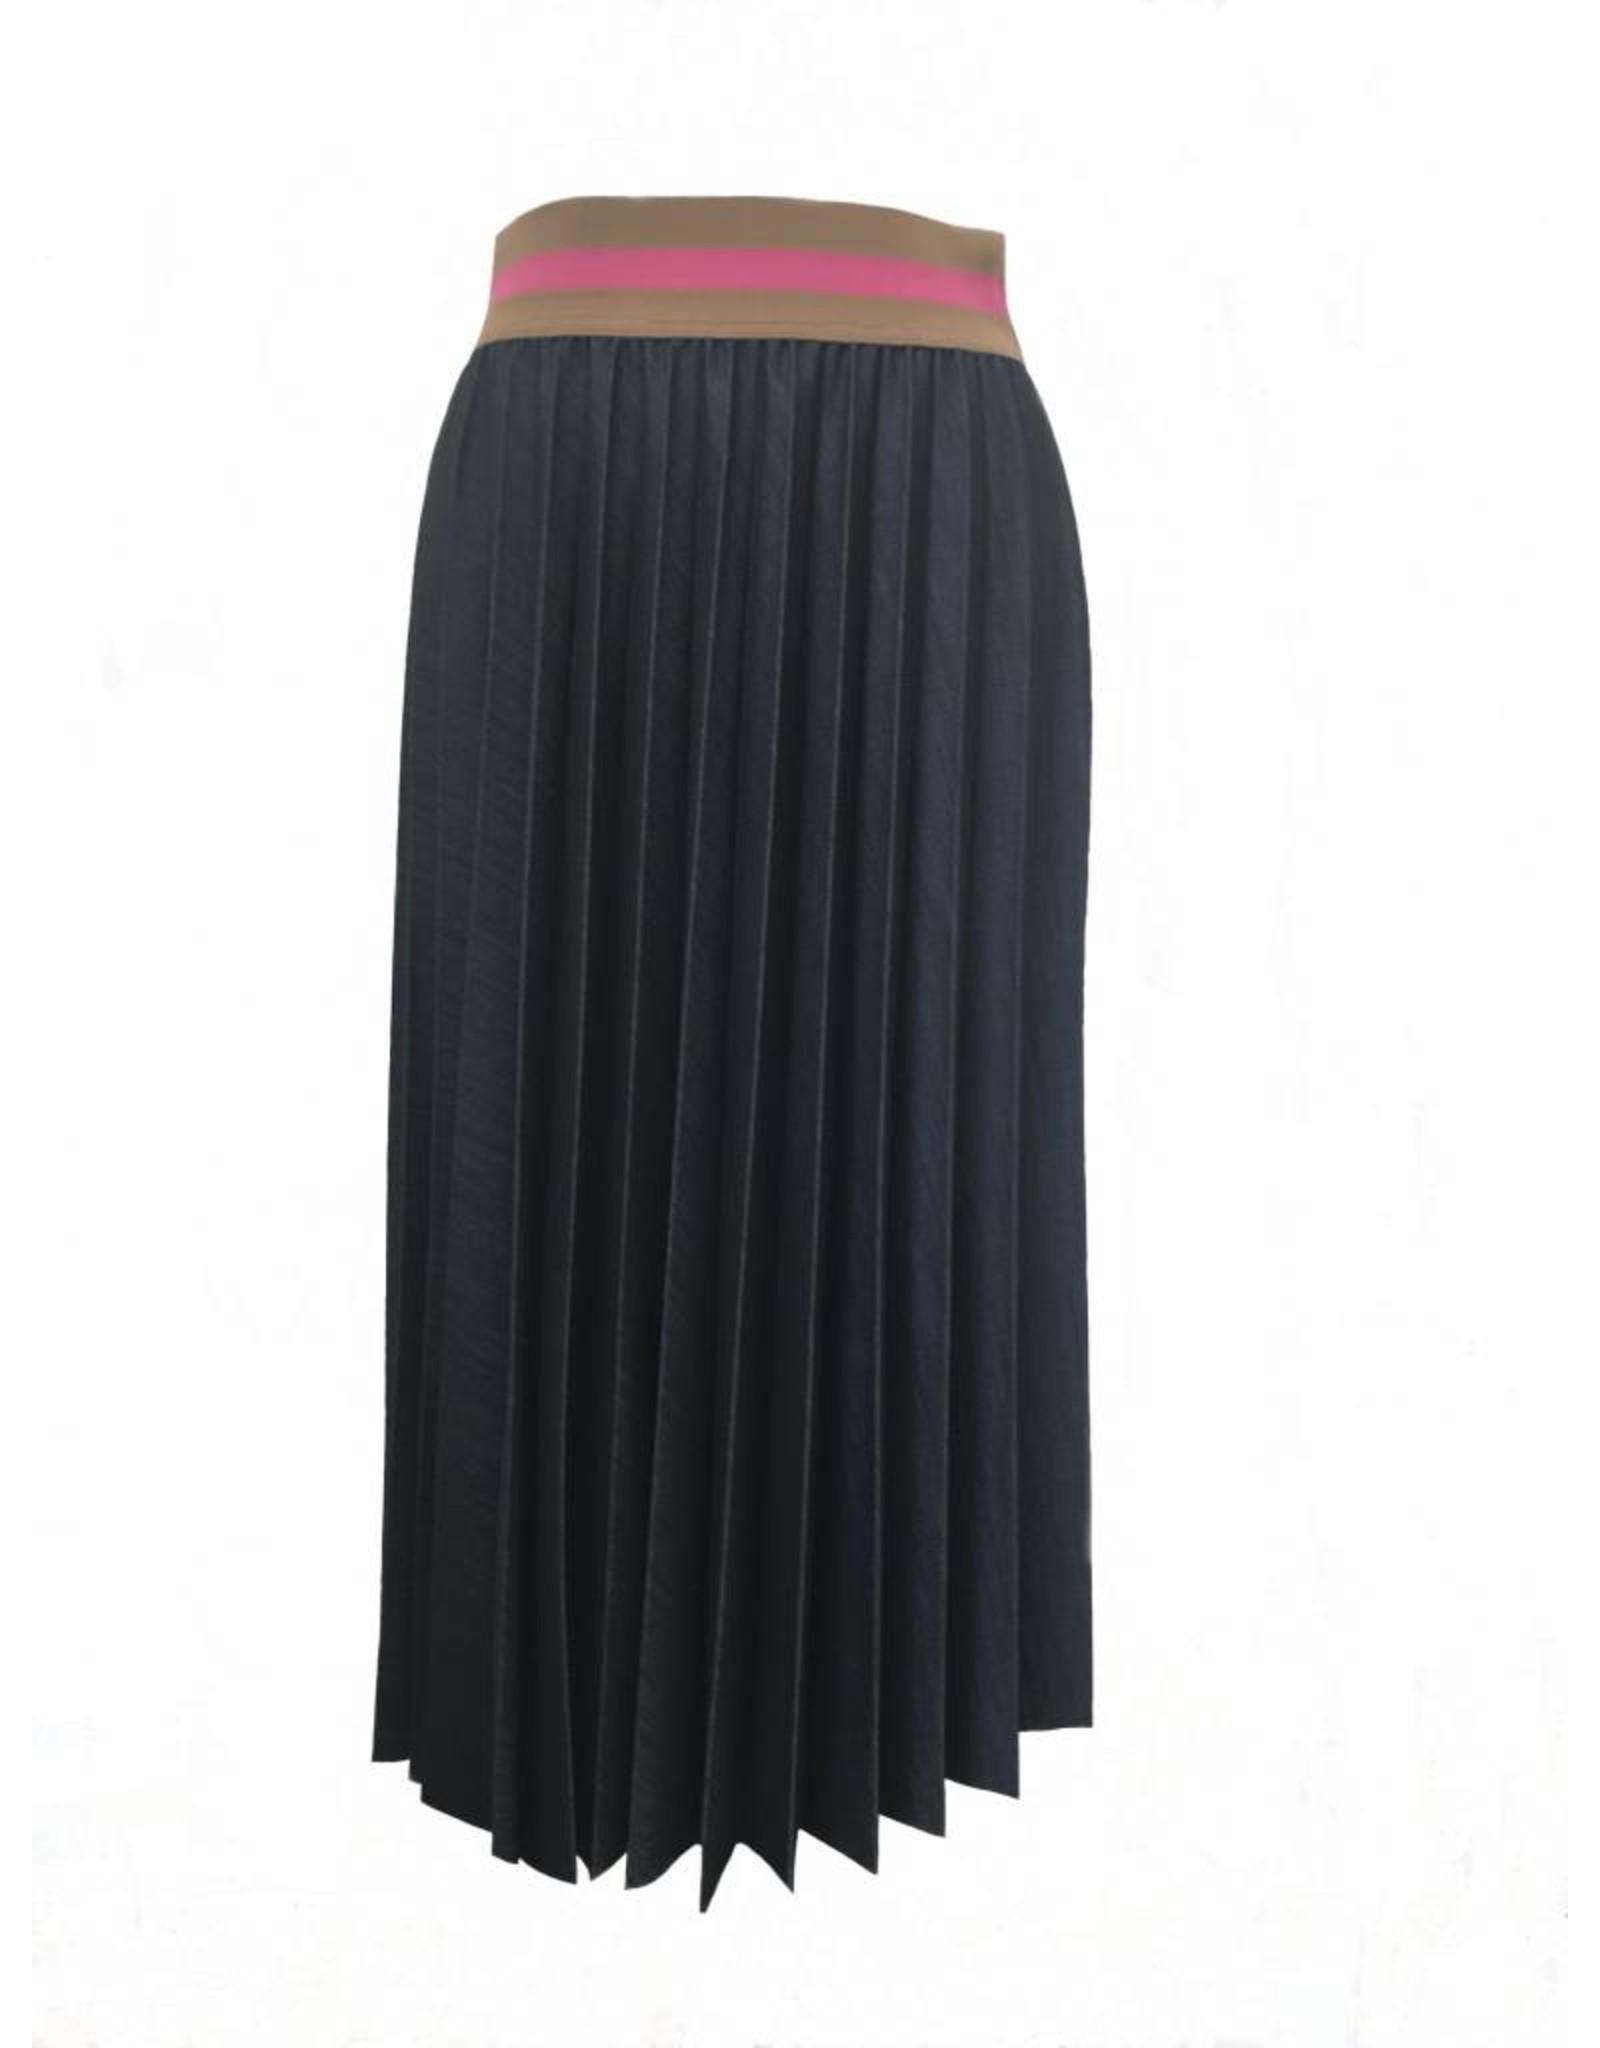 Souvenir Clubbing Denim pleated skirt